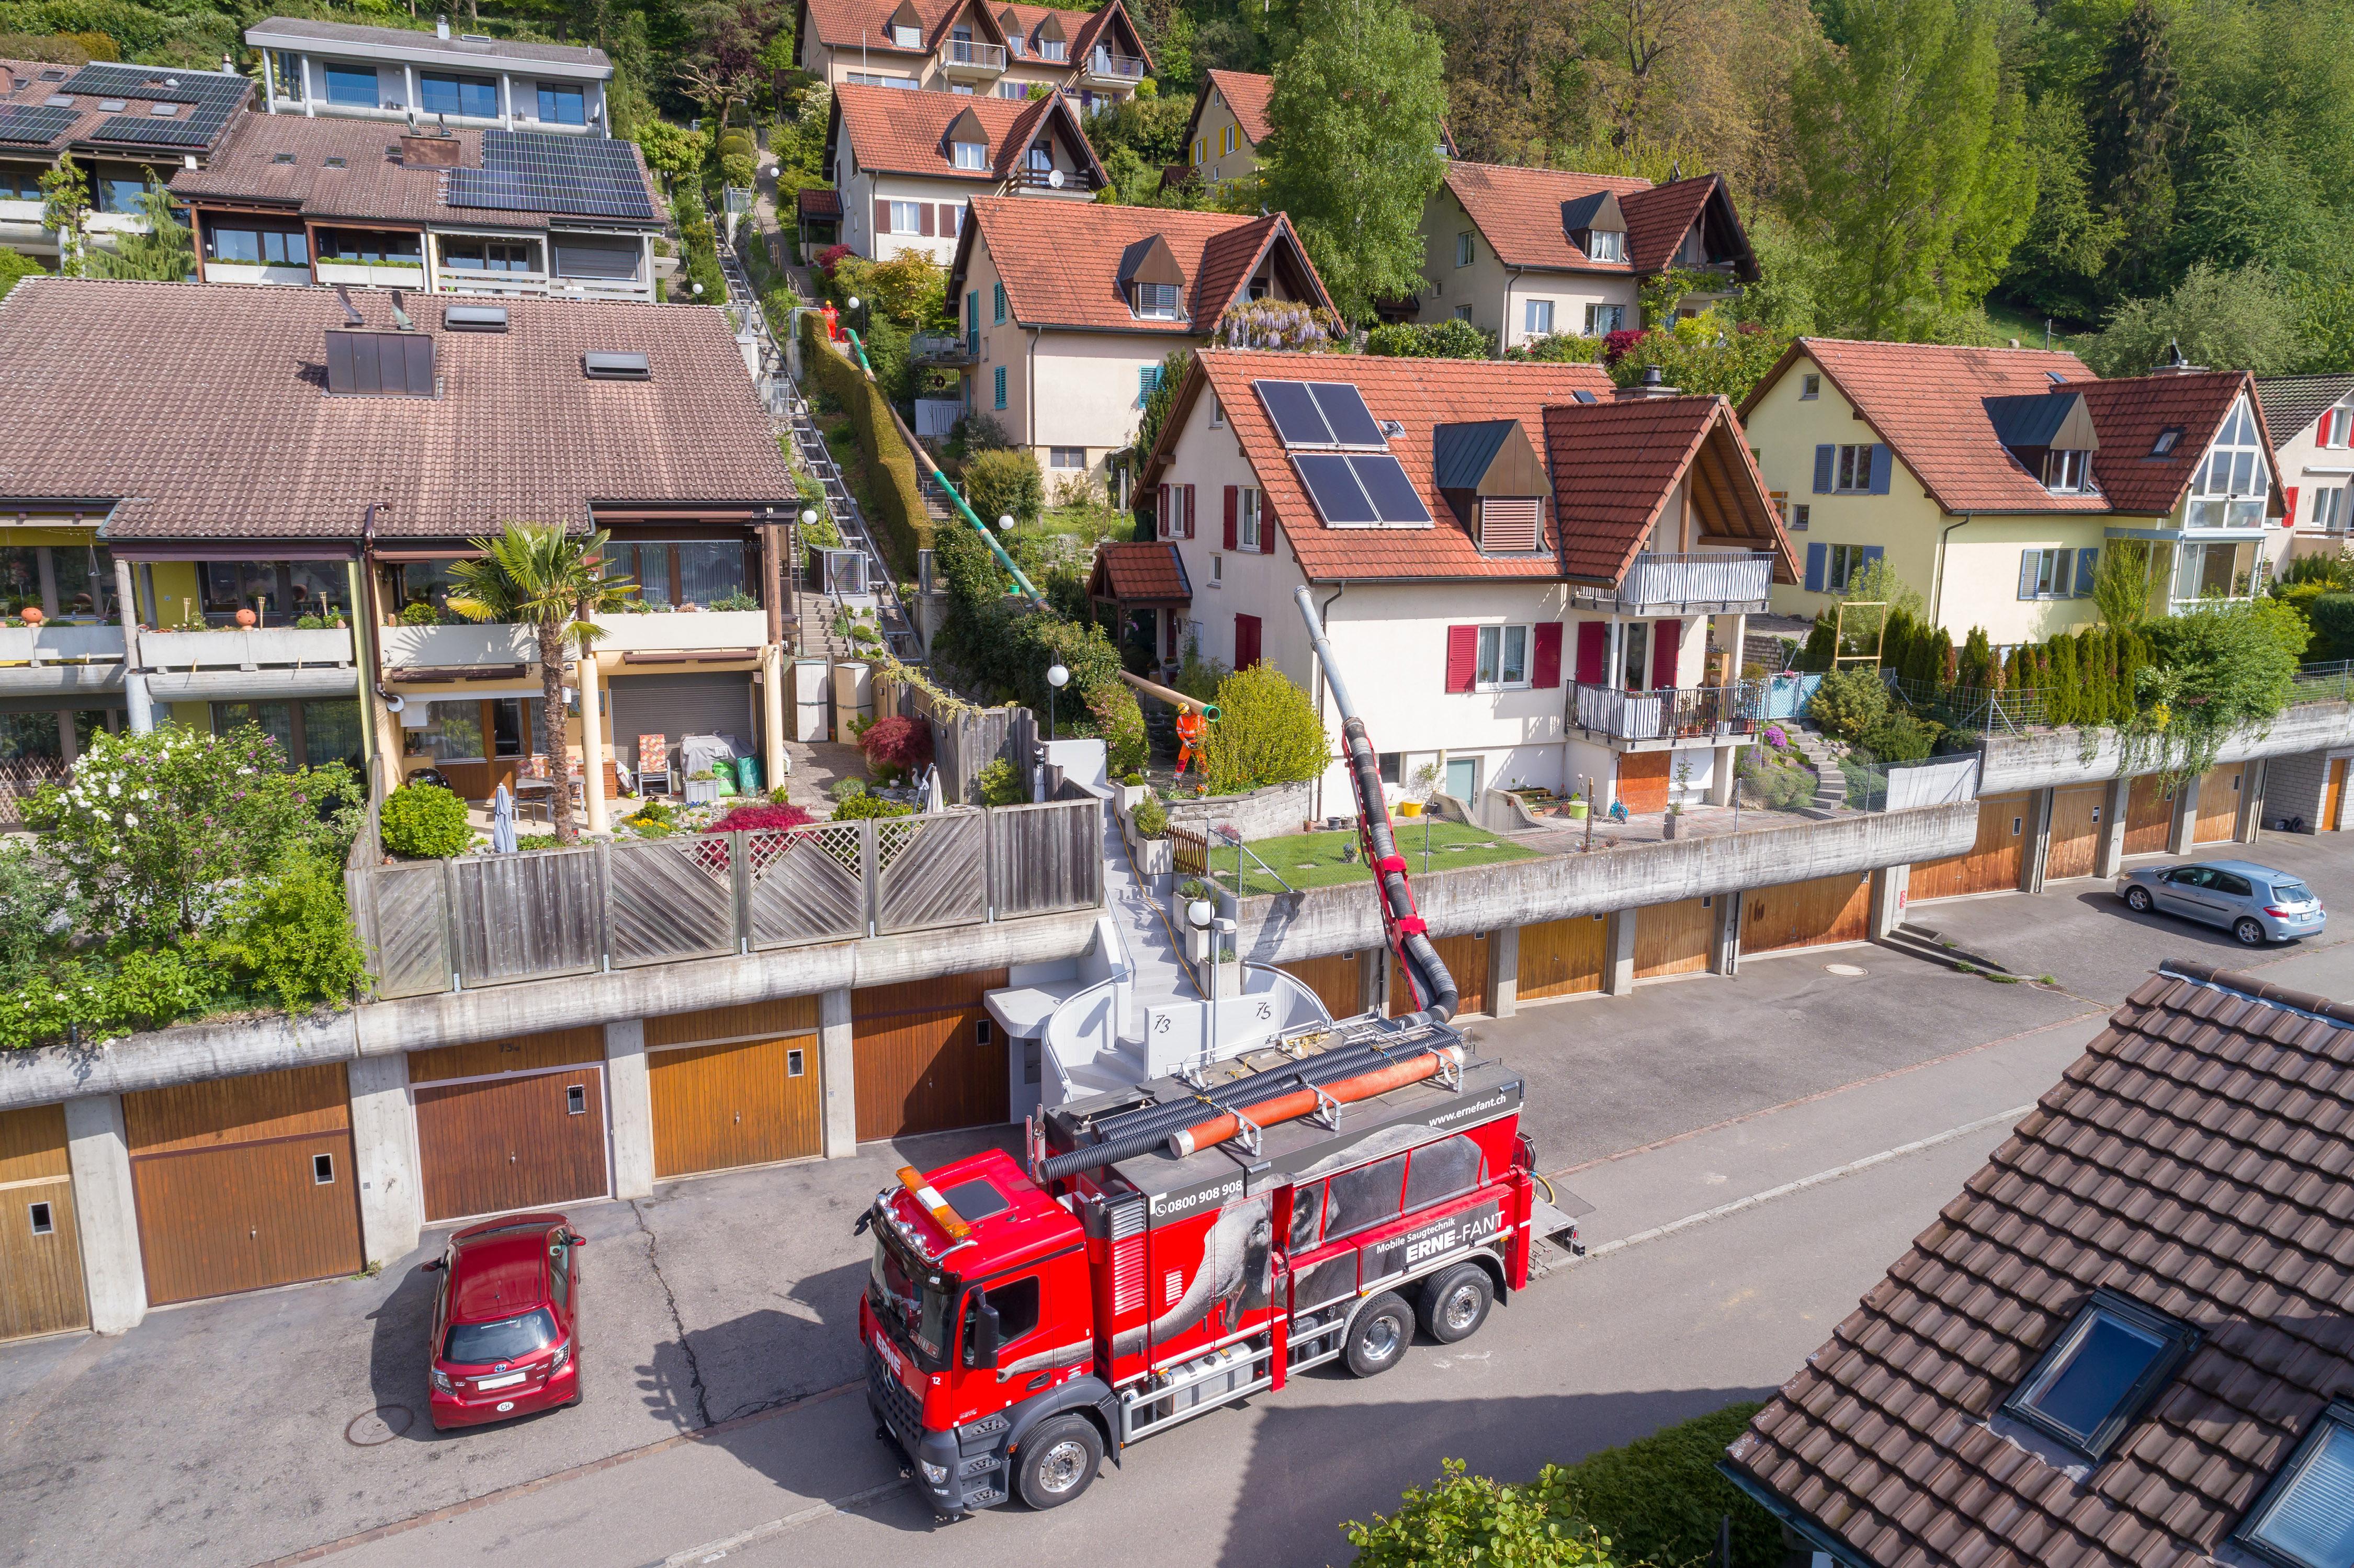 Brugg Wasserleitungsbruch Saugbagger ERNE-FANT